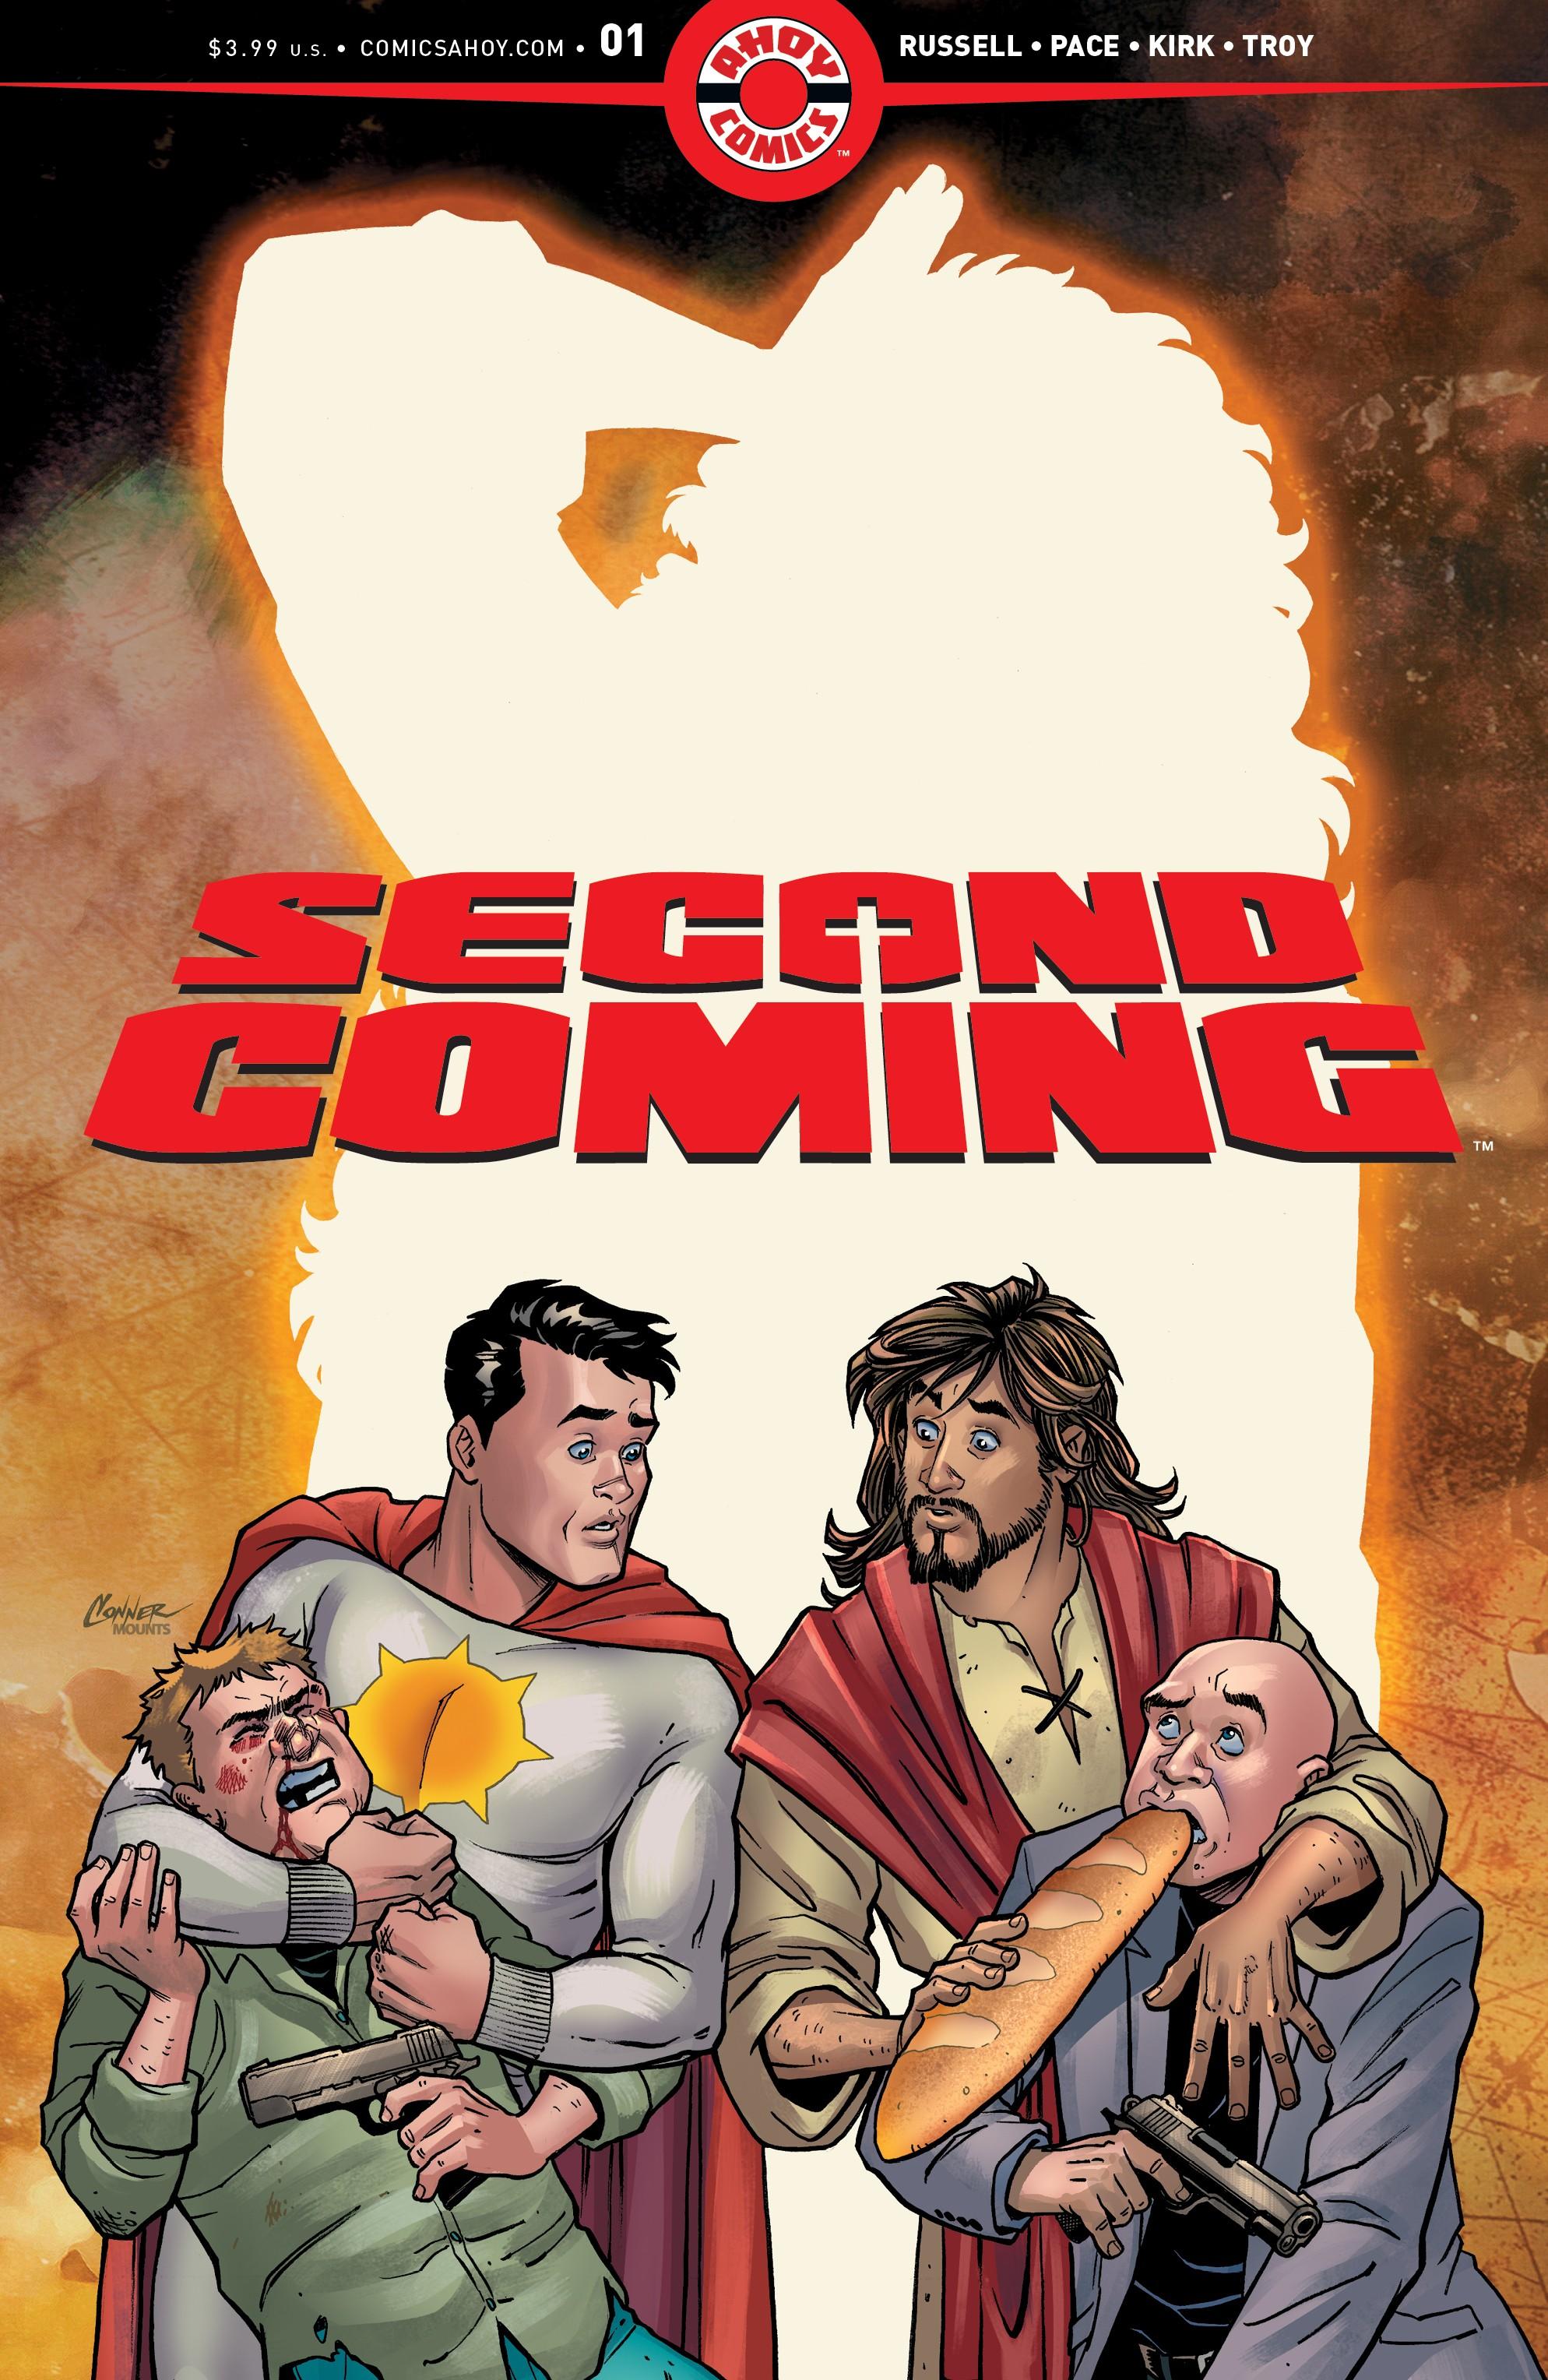 Richard Pace CVR B Second Coming #1 Ahoy Comics 2019 1st Print CONTROVERSIAL